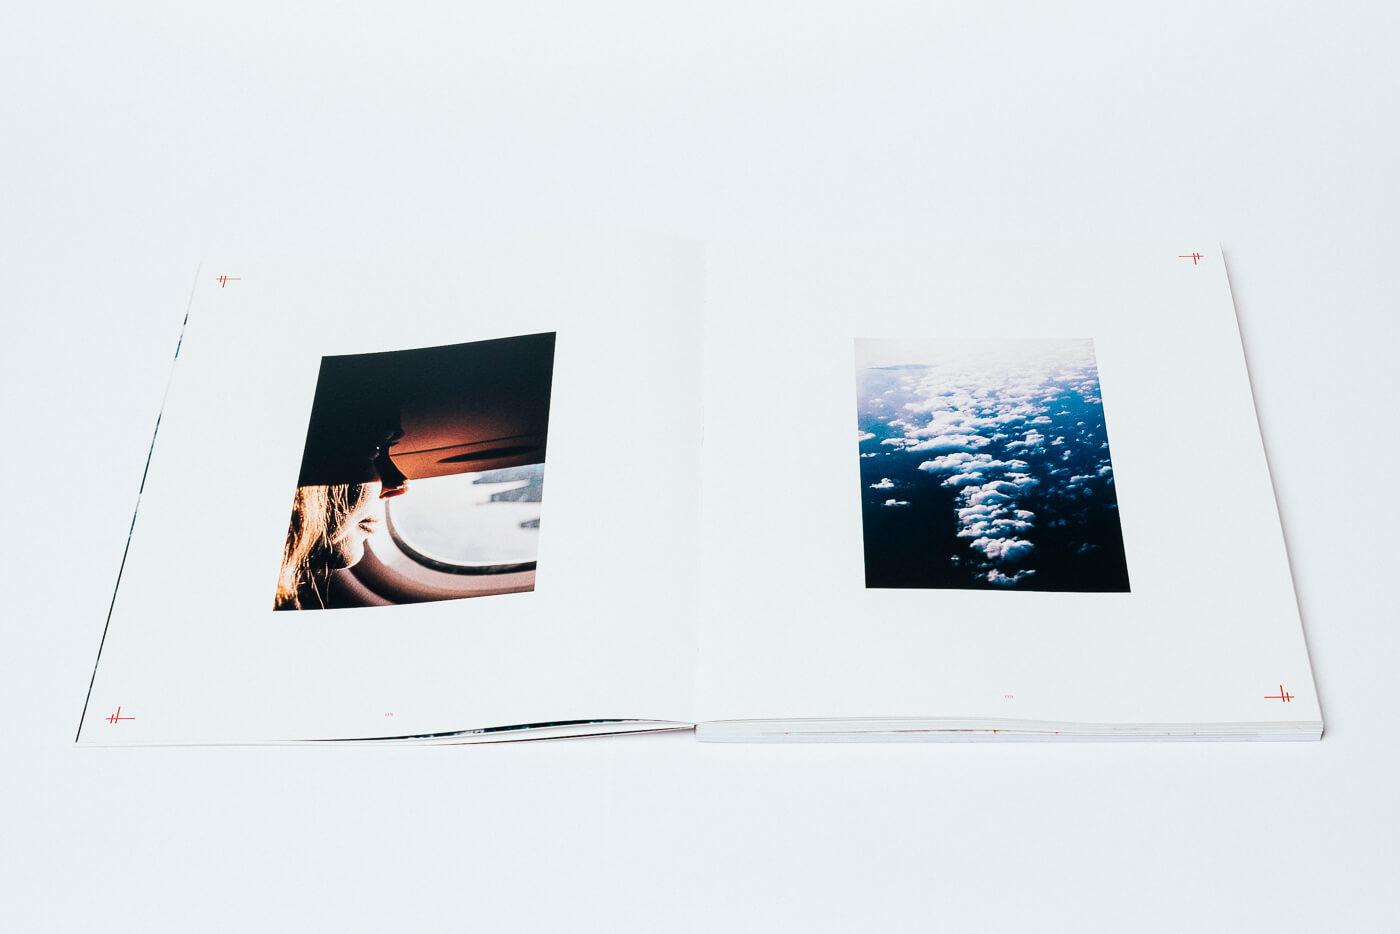 Fotobuch no shoes beyond this point Milan Soremski Soremski Design, Fotografie und Film